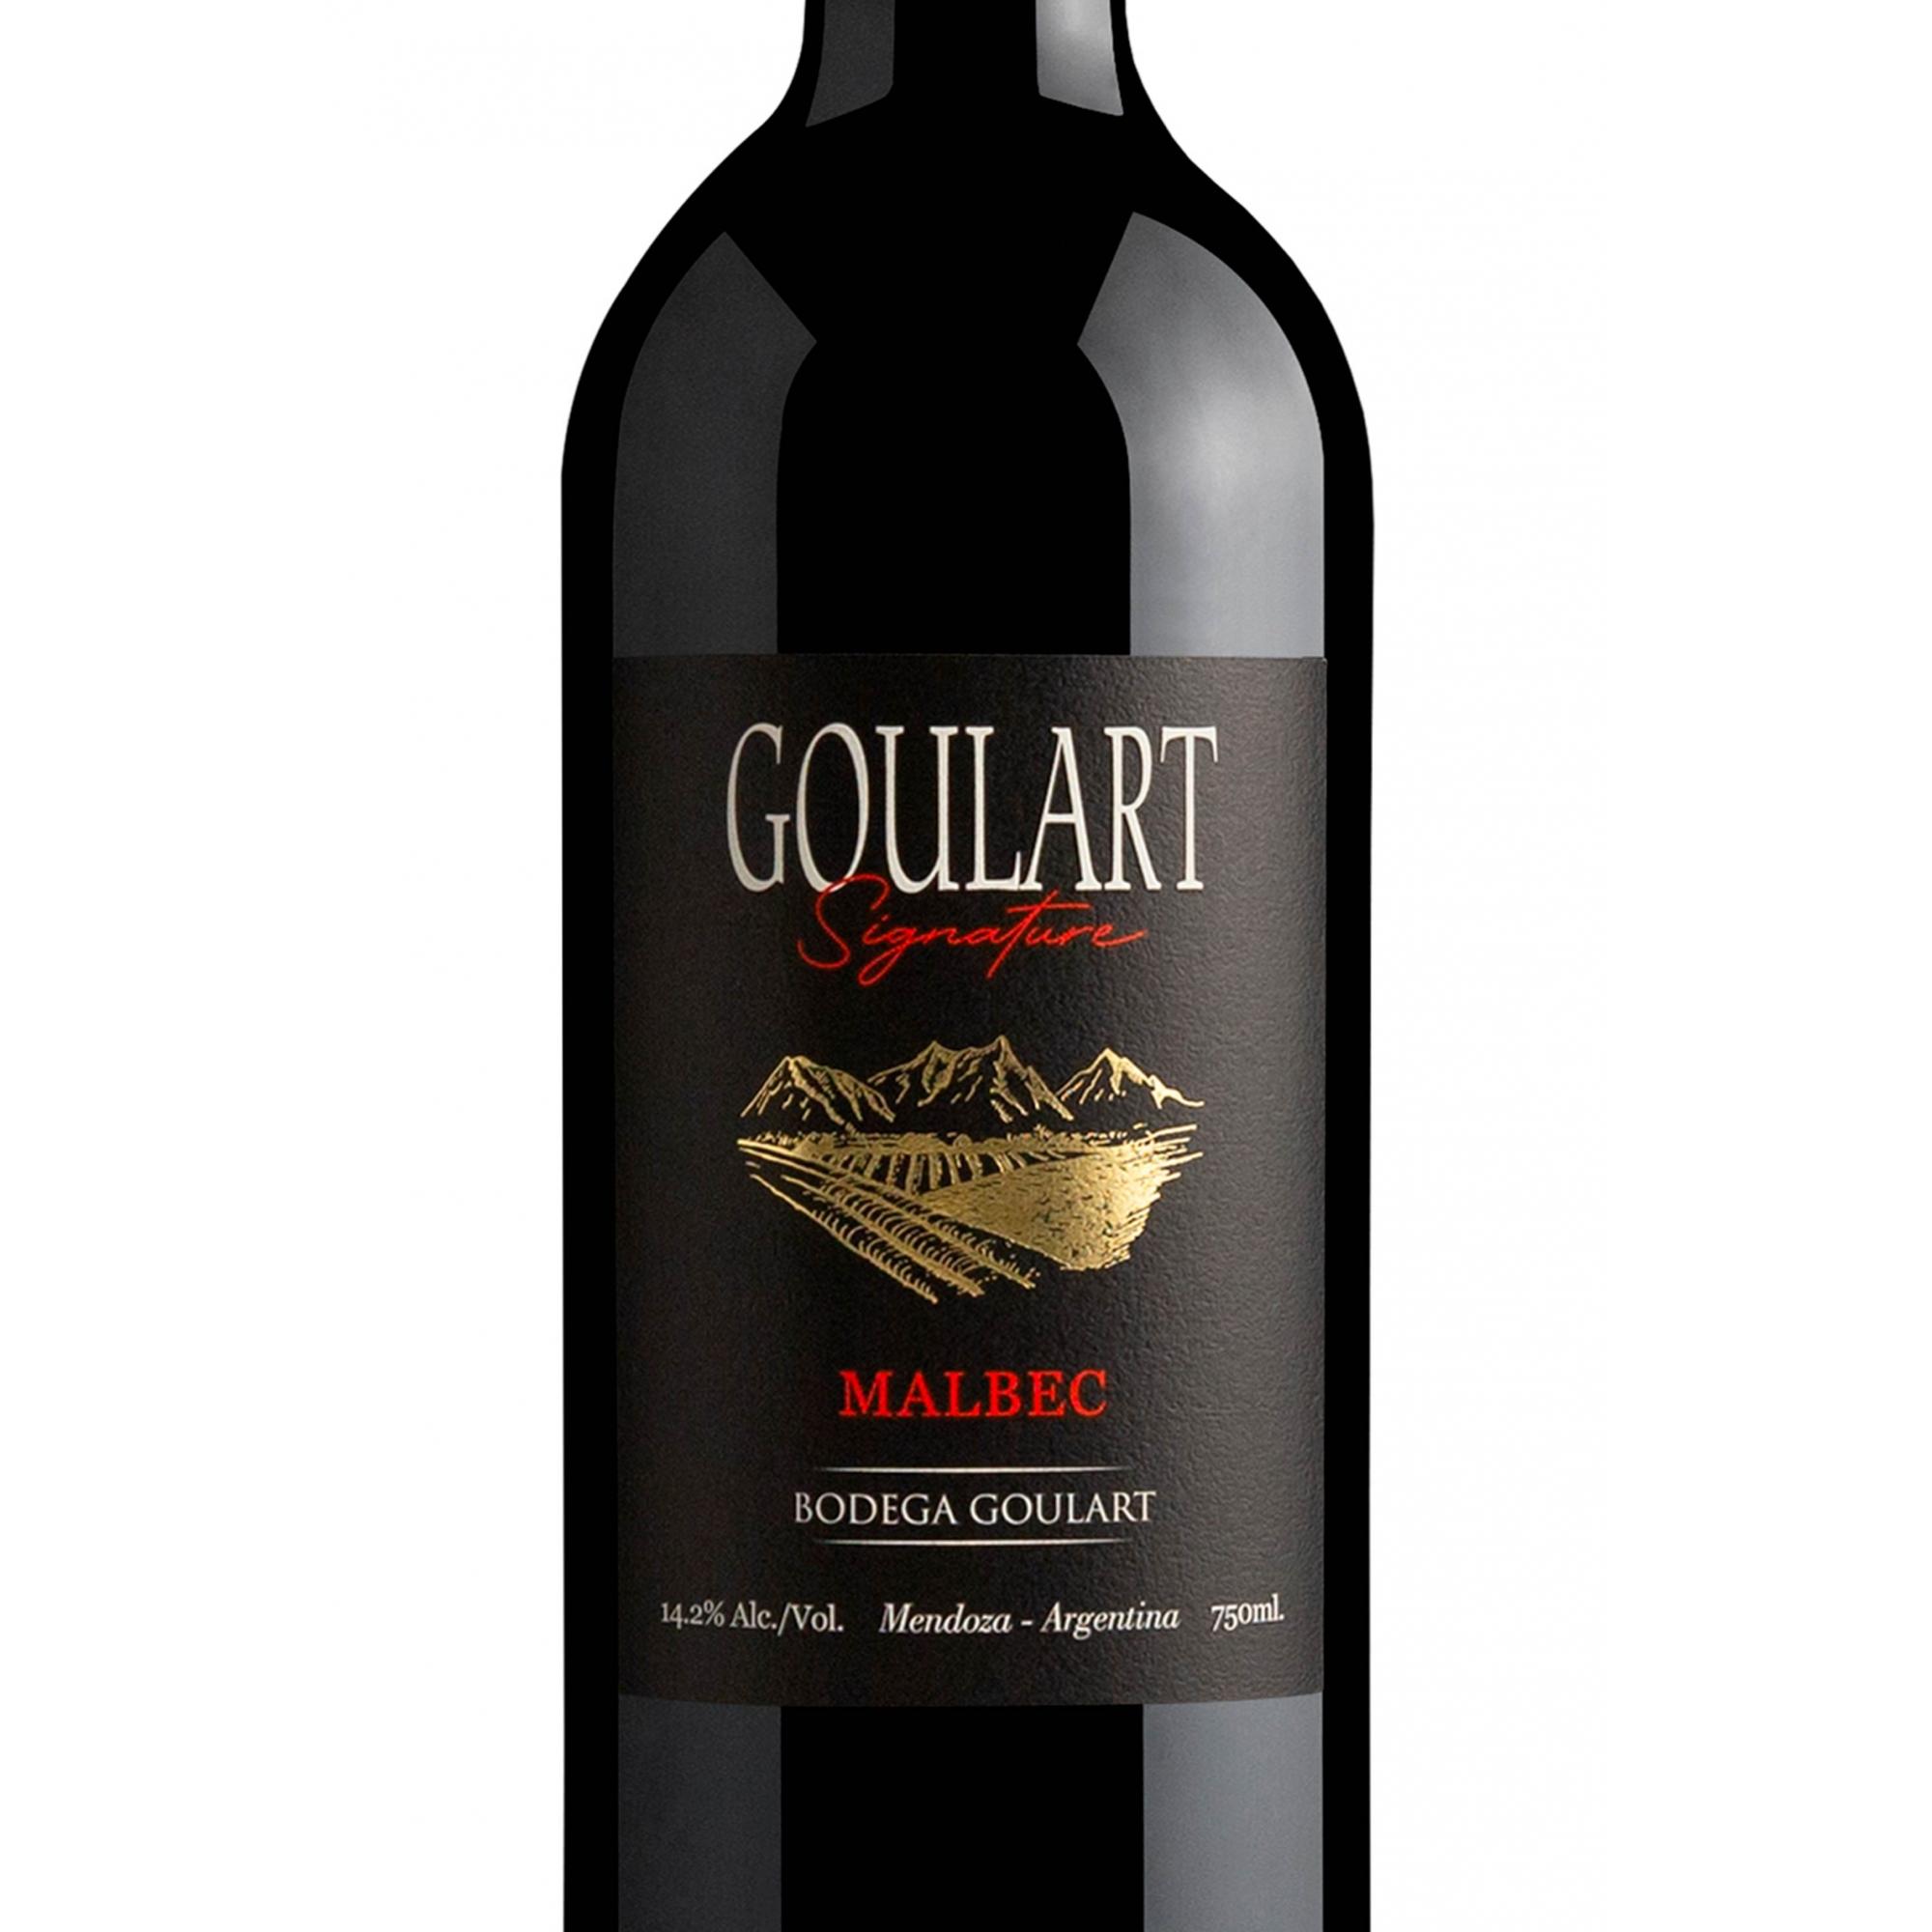 Goulart Signature Malbec 2020 - 750 ml